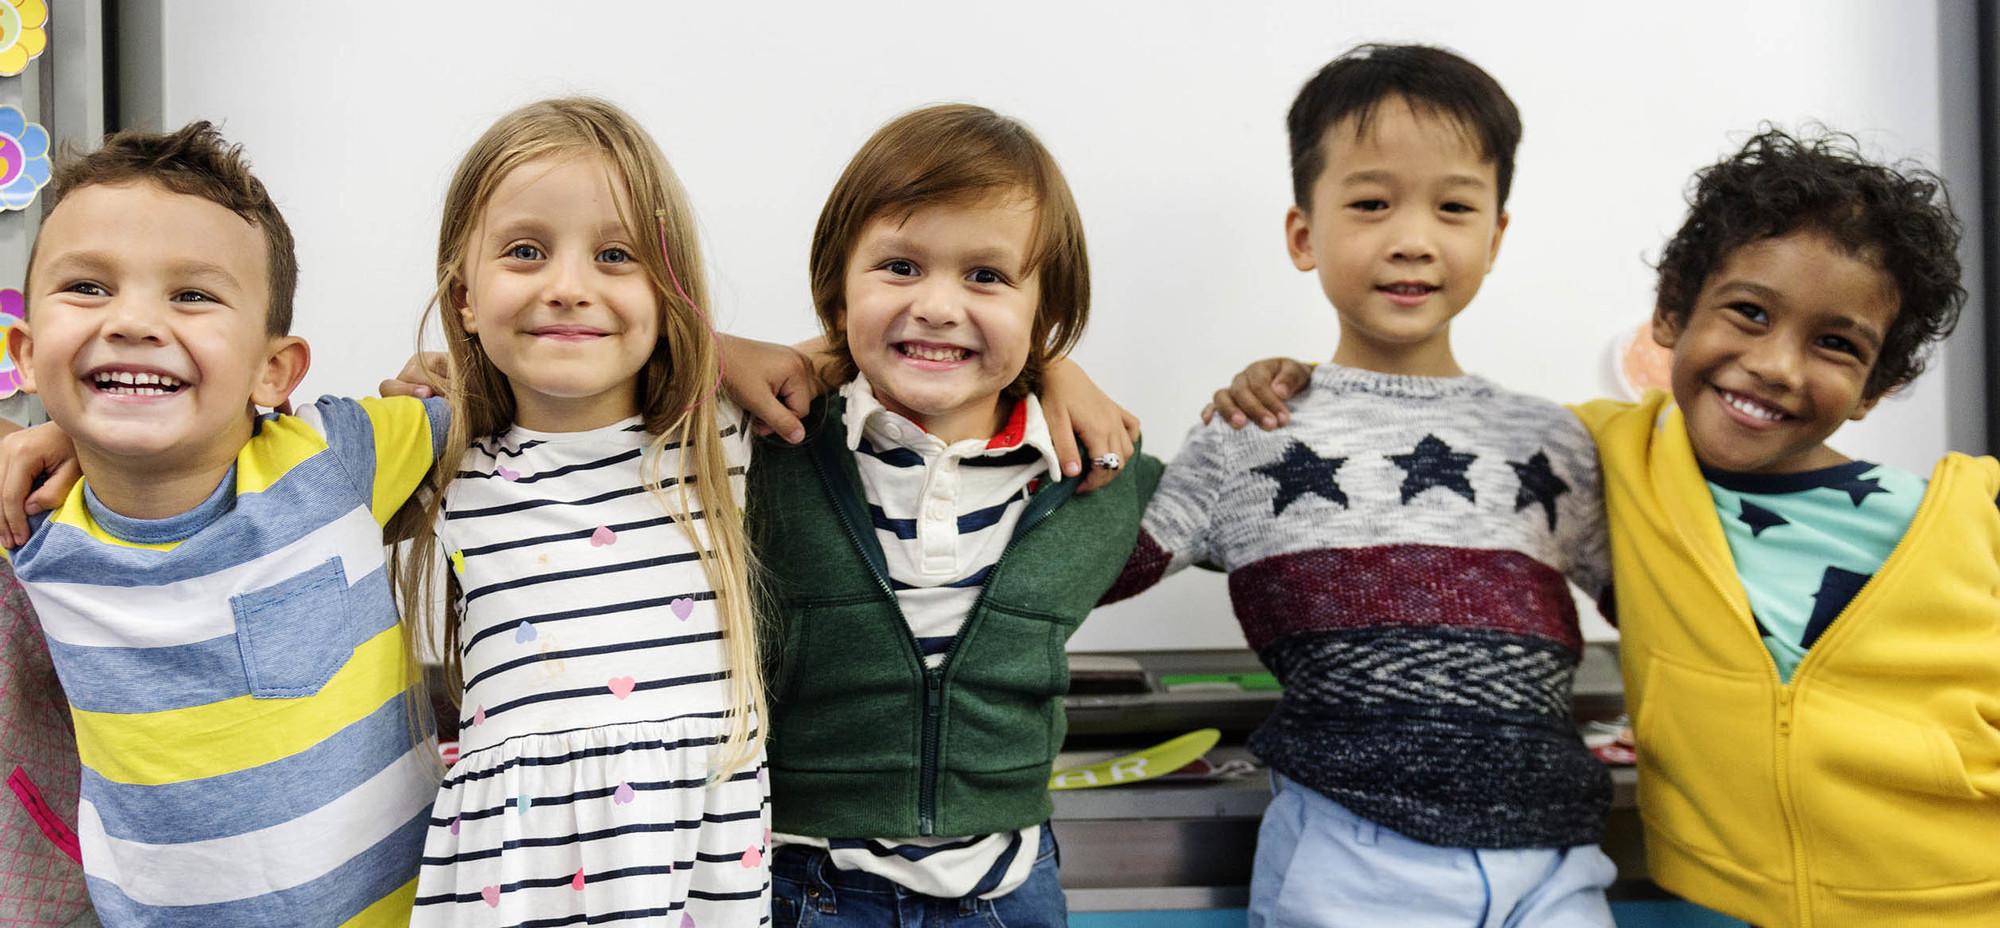 Photo of diverse group of kindergartners hugging